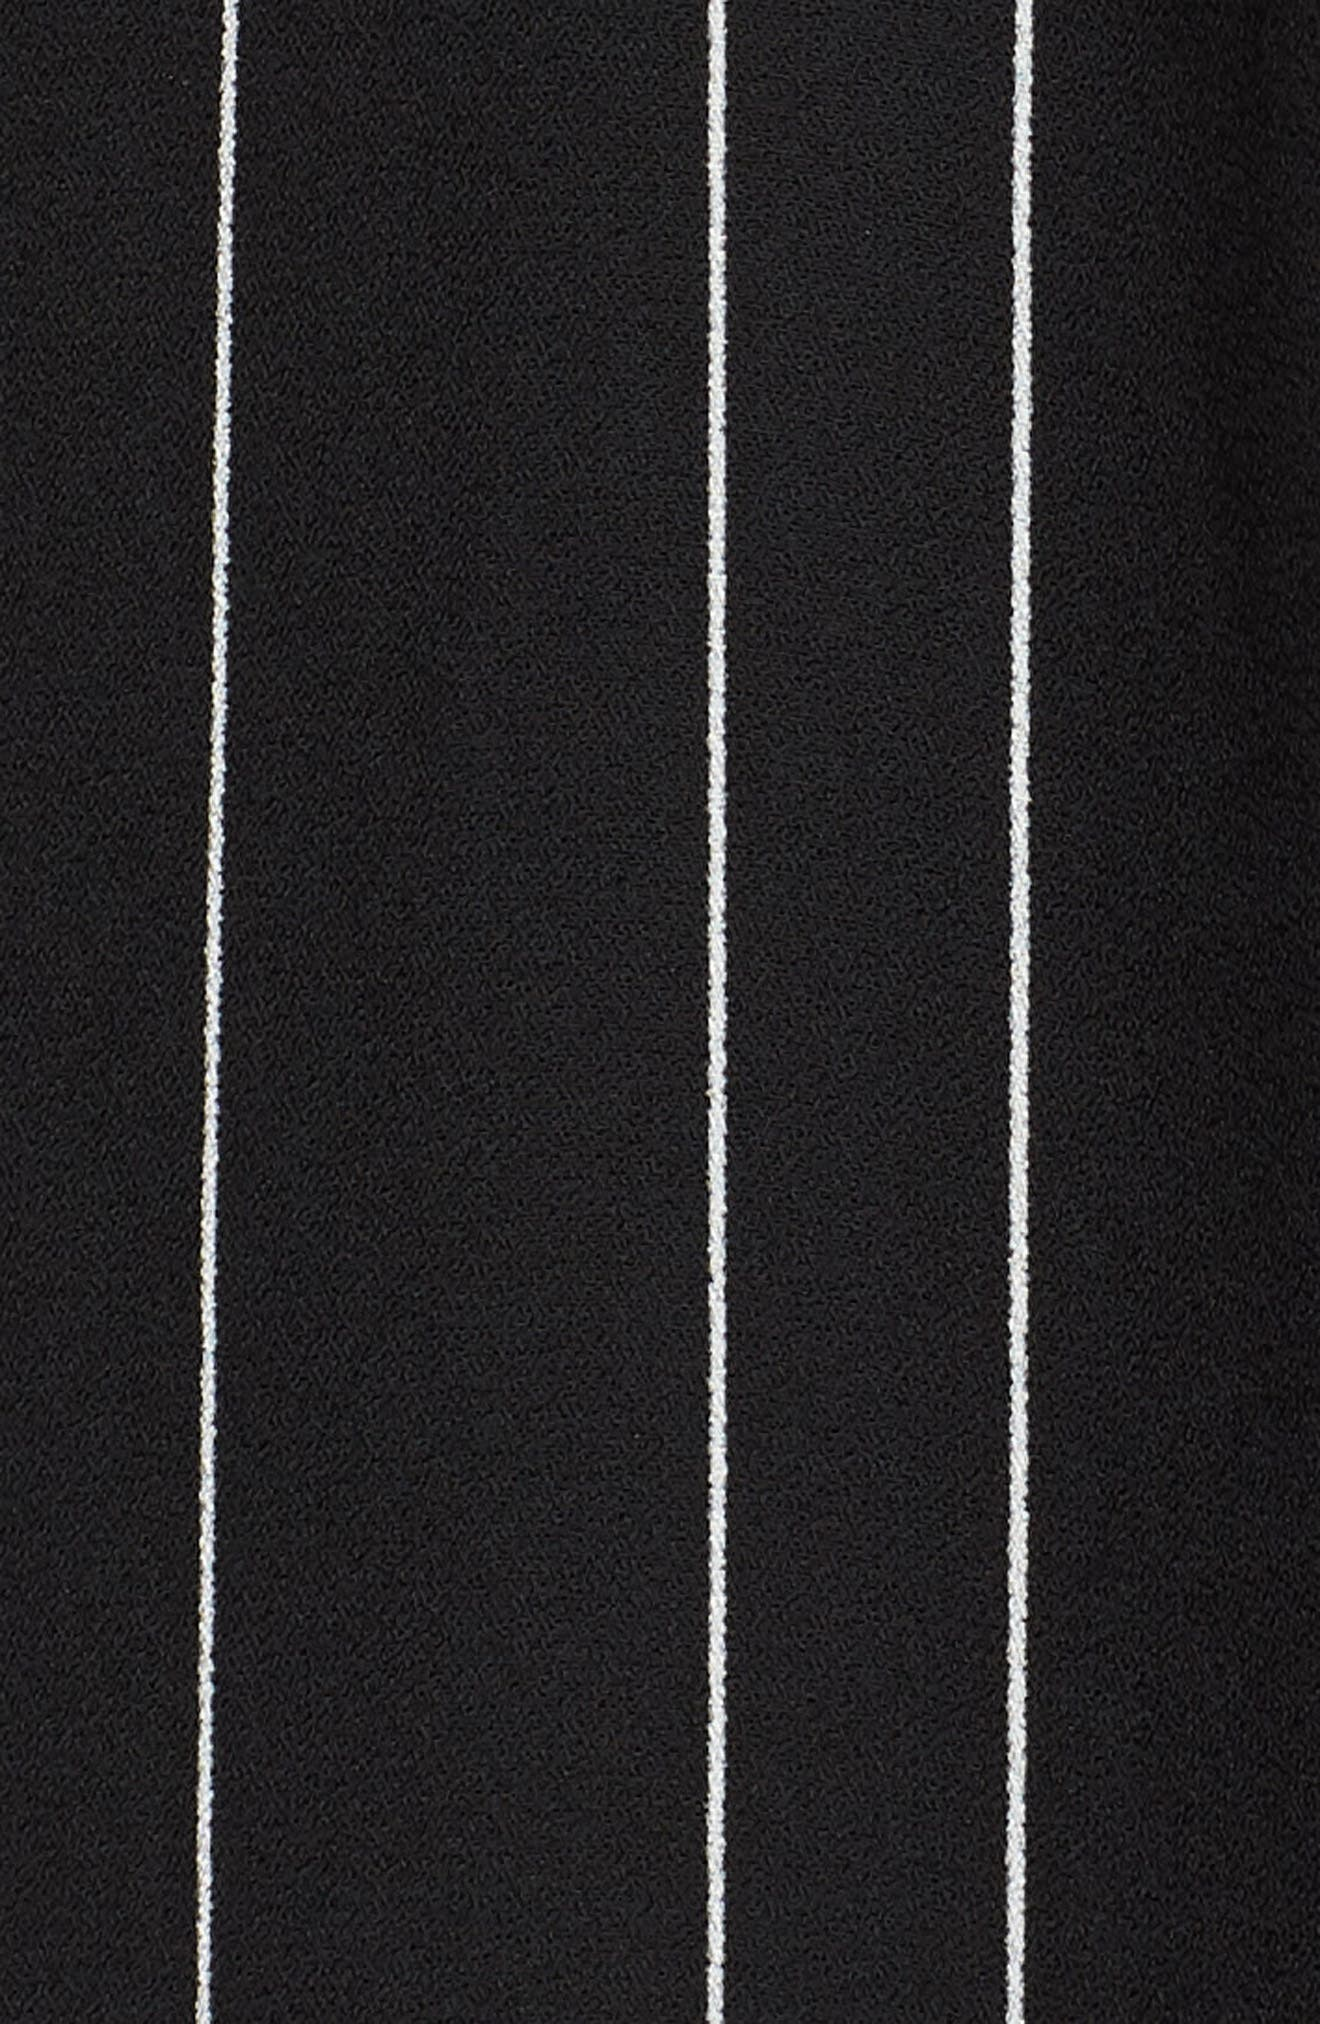 Dolman Sleeve Jumpsuit,                             Alternate thumbnail 6, color,                             001